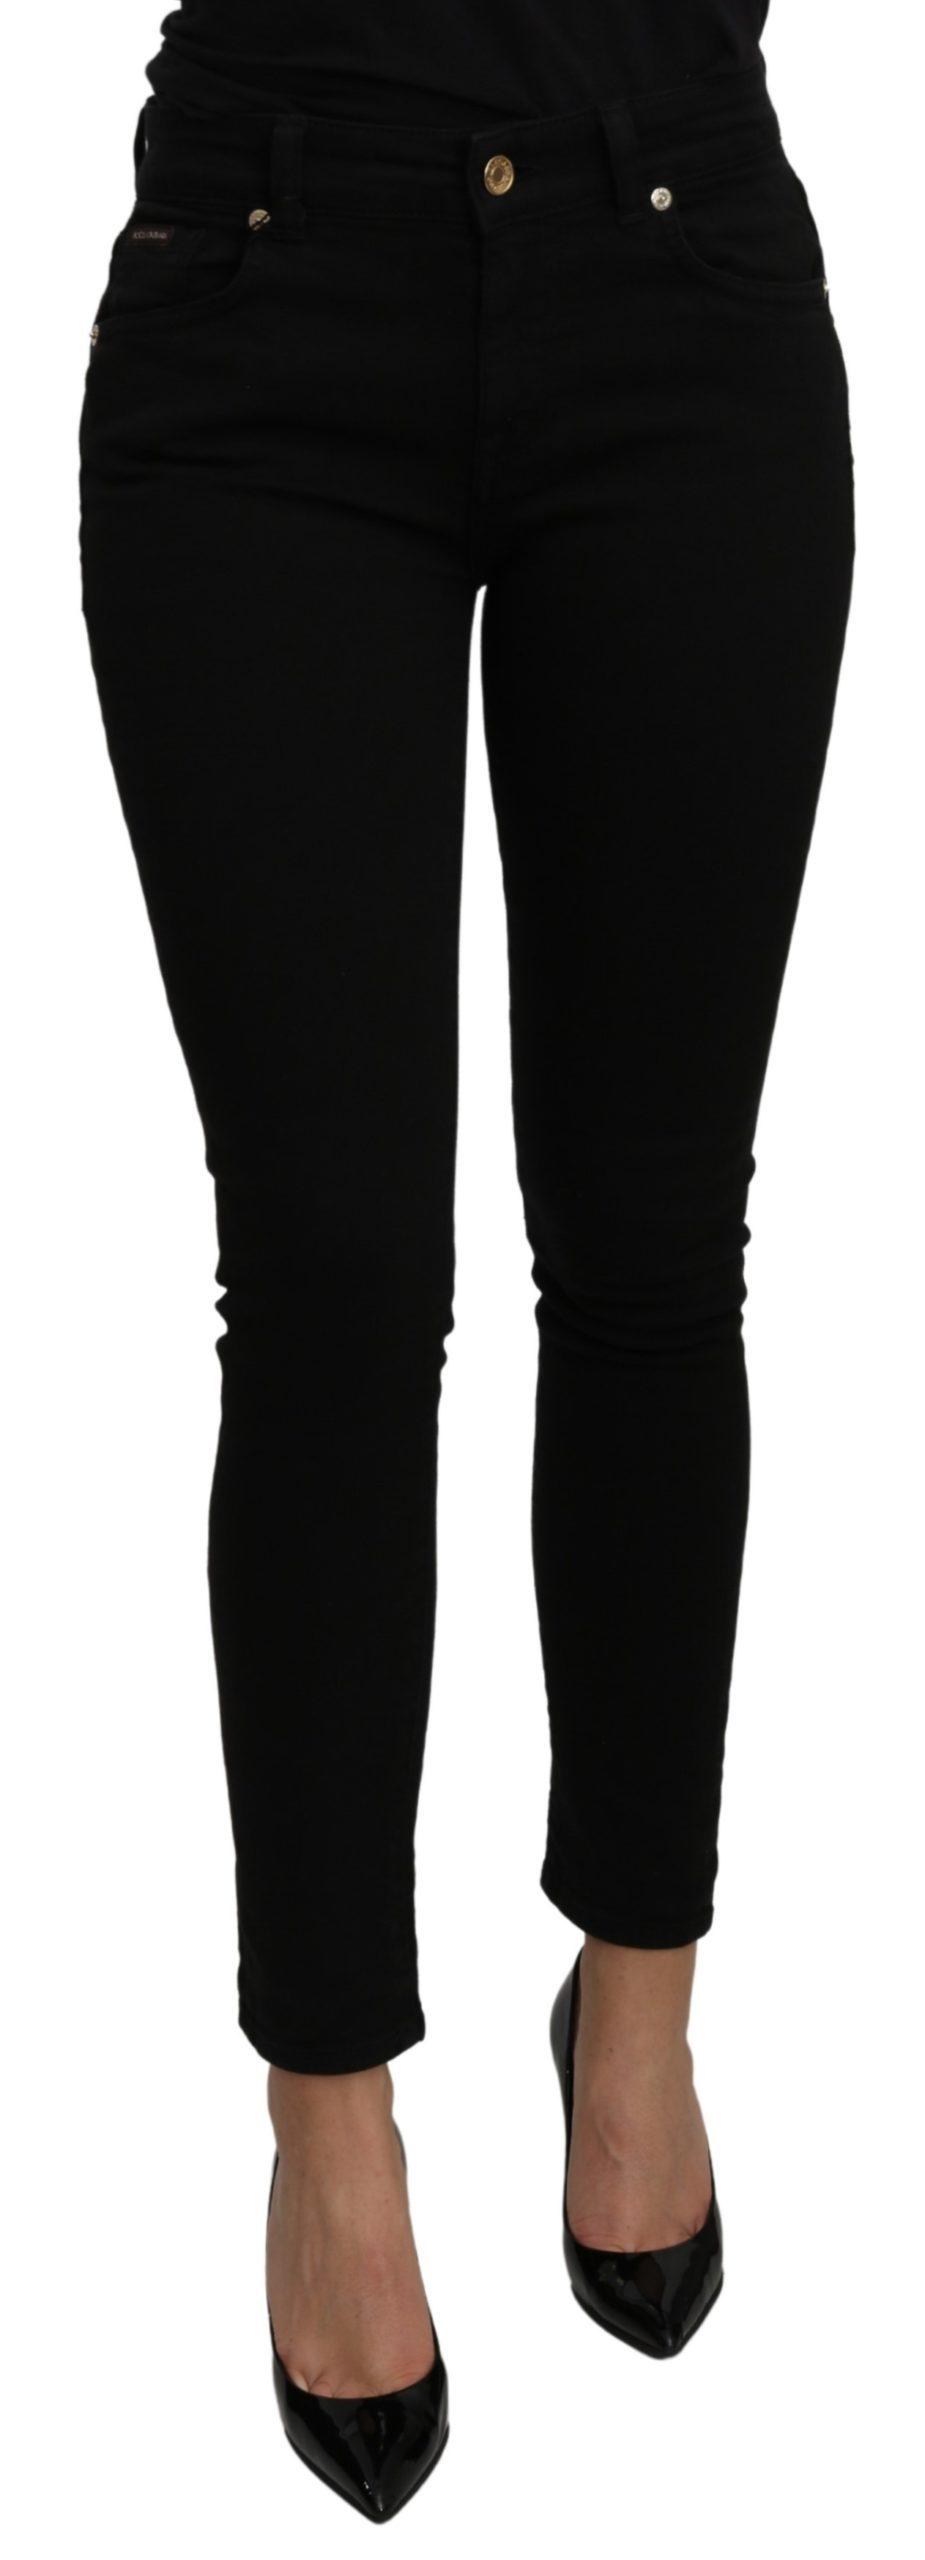 Dolce & Gabbana Women's Mid Waist Slim Fit Cotton Jeans Black PAN71107 - IT38|XS